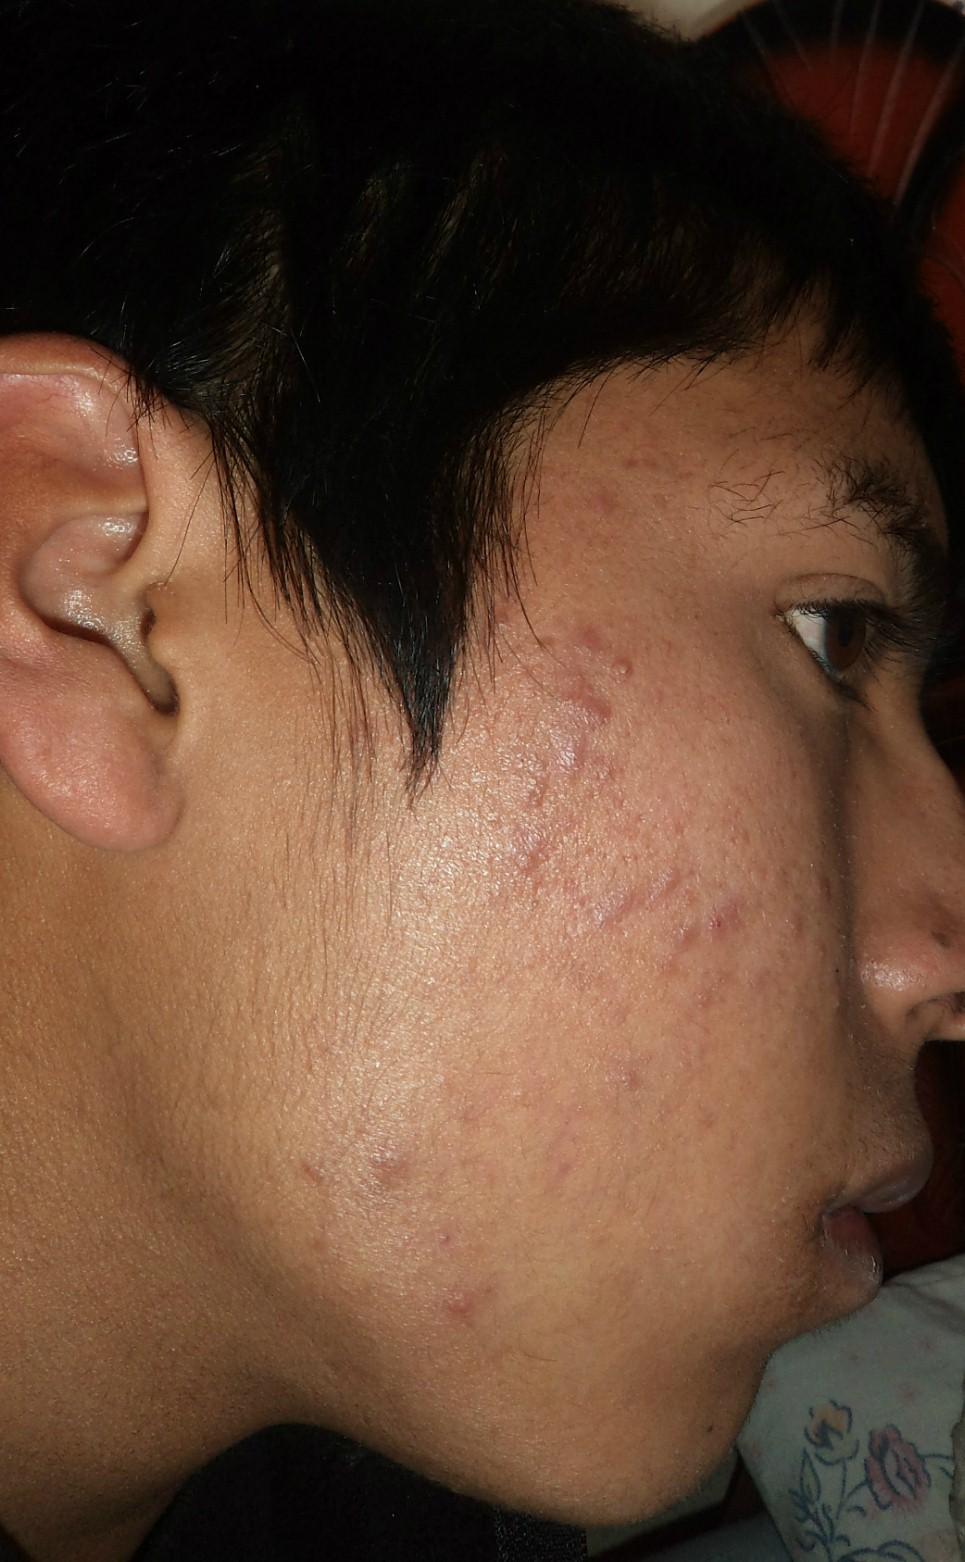 Tratamiento con Acnotin 20mg/dìa Zogbuw